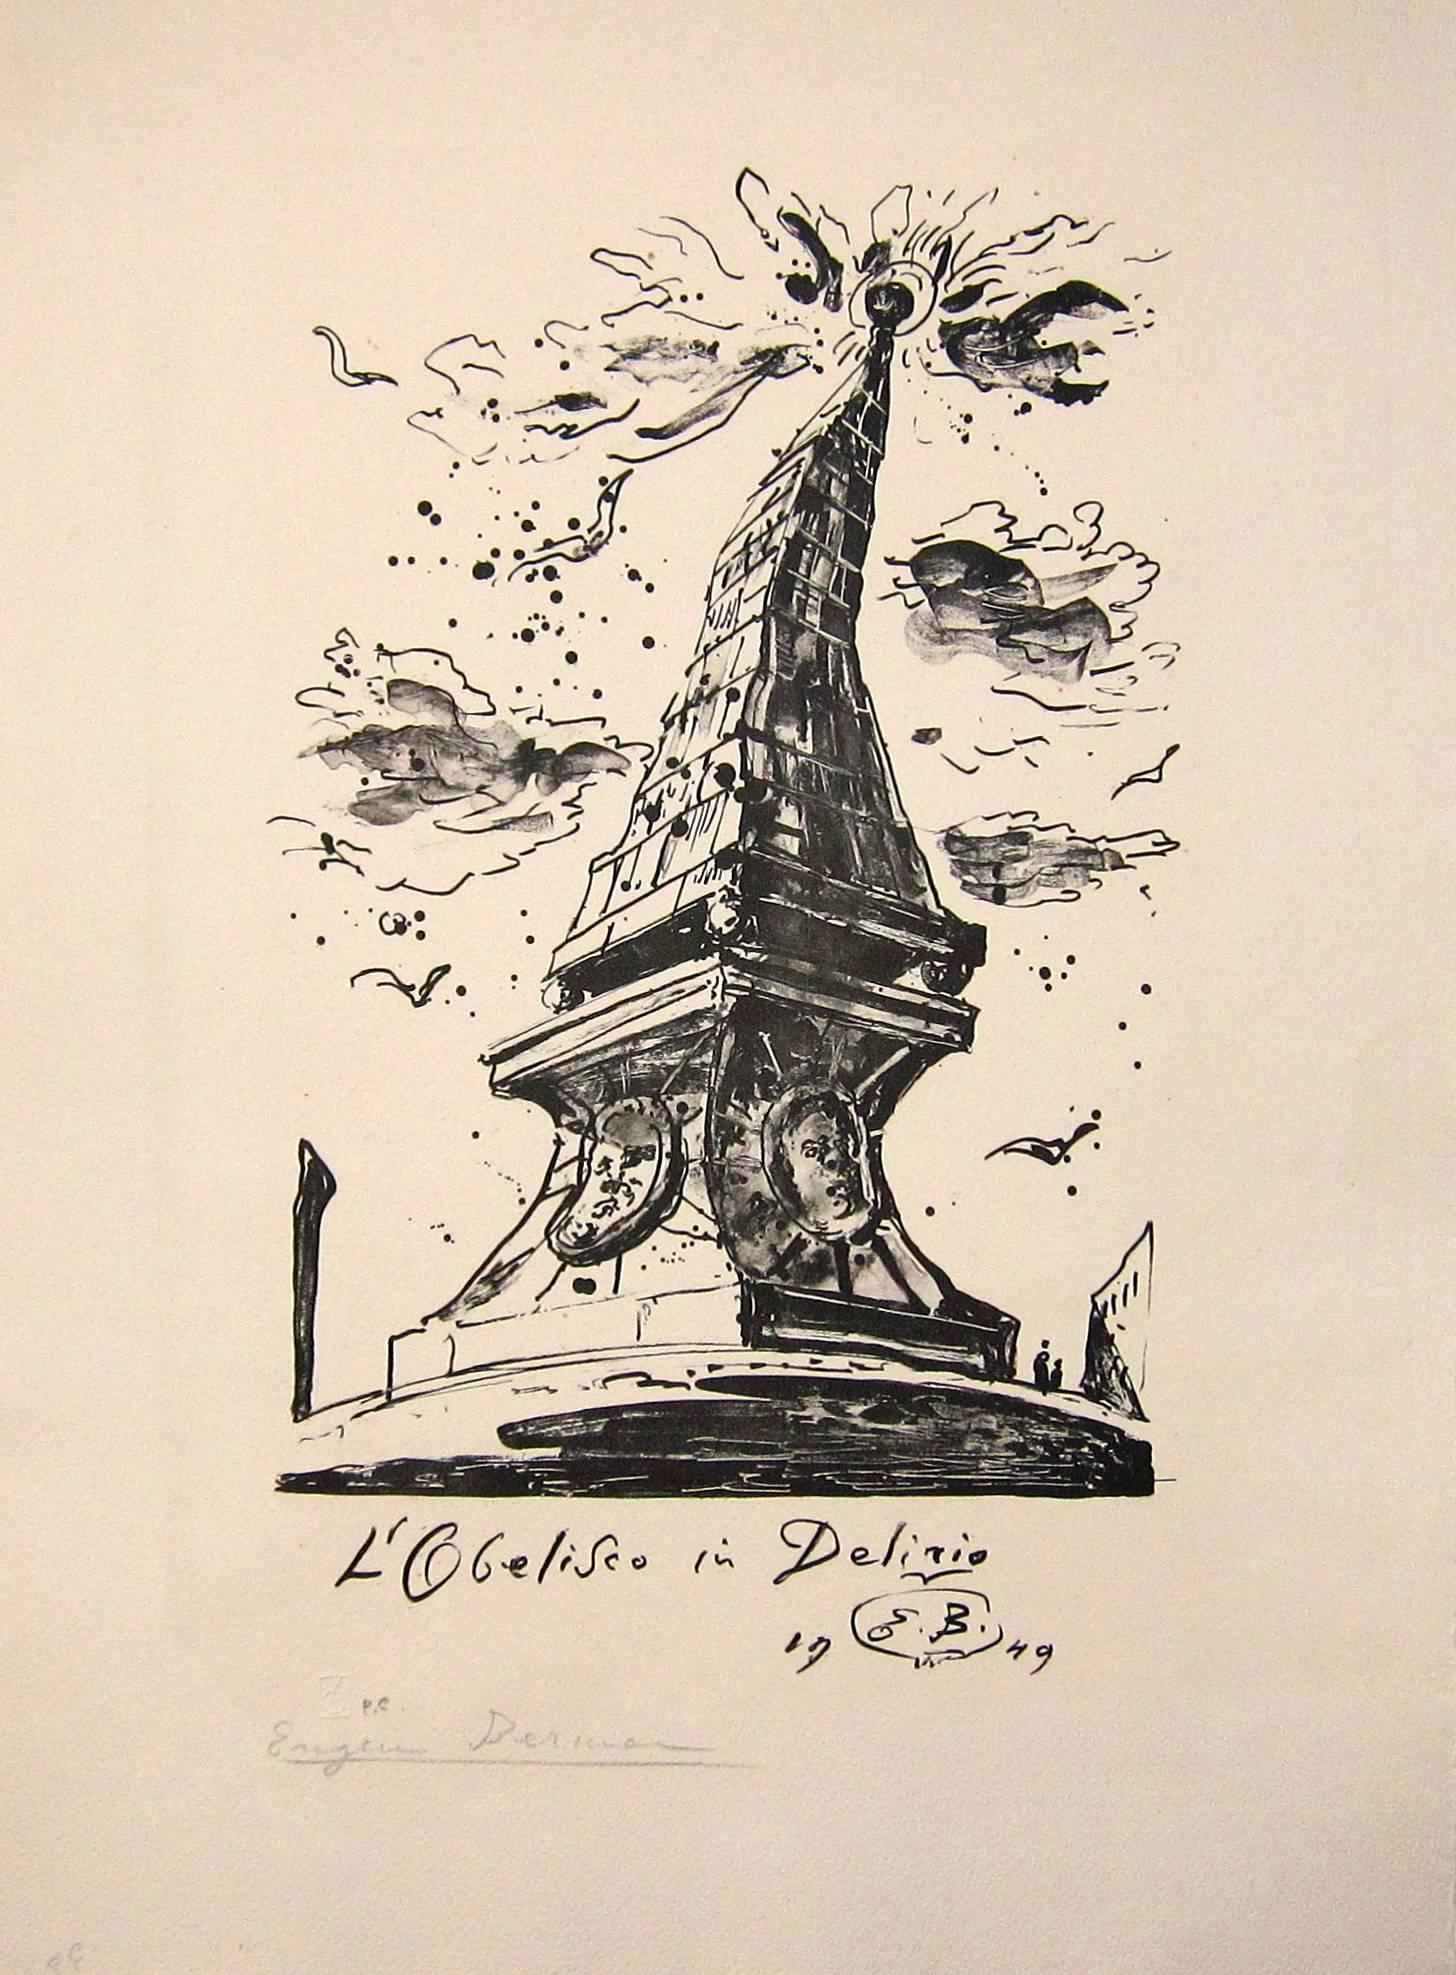 Lot 52 - EUGENE BERMAN [1899-1972]. Obelisk in Delirio, 1949. lithograph, edition of 25, artist's proof.